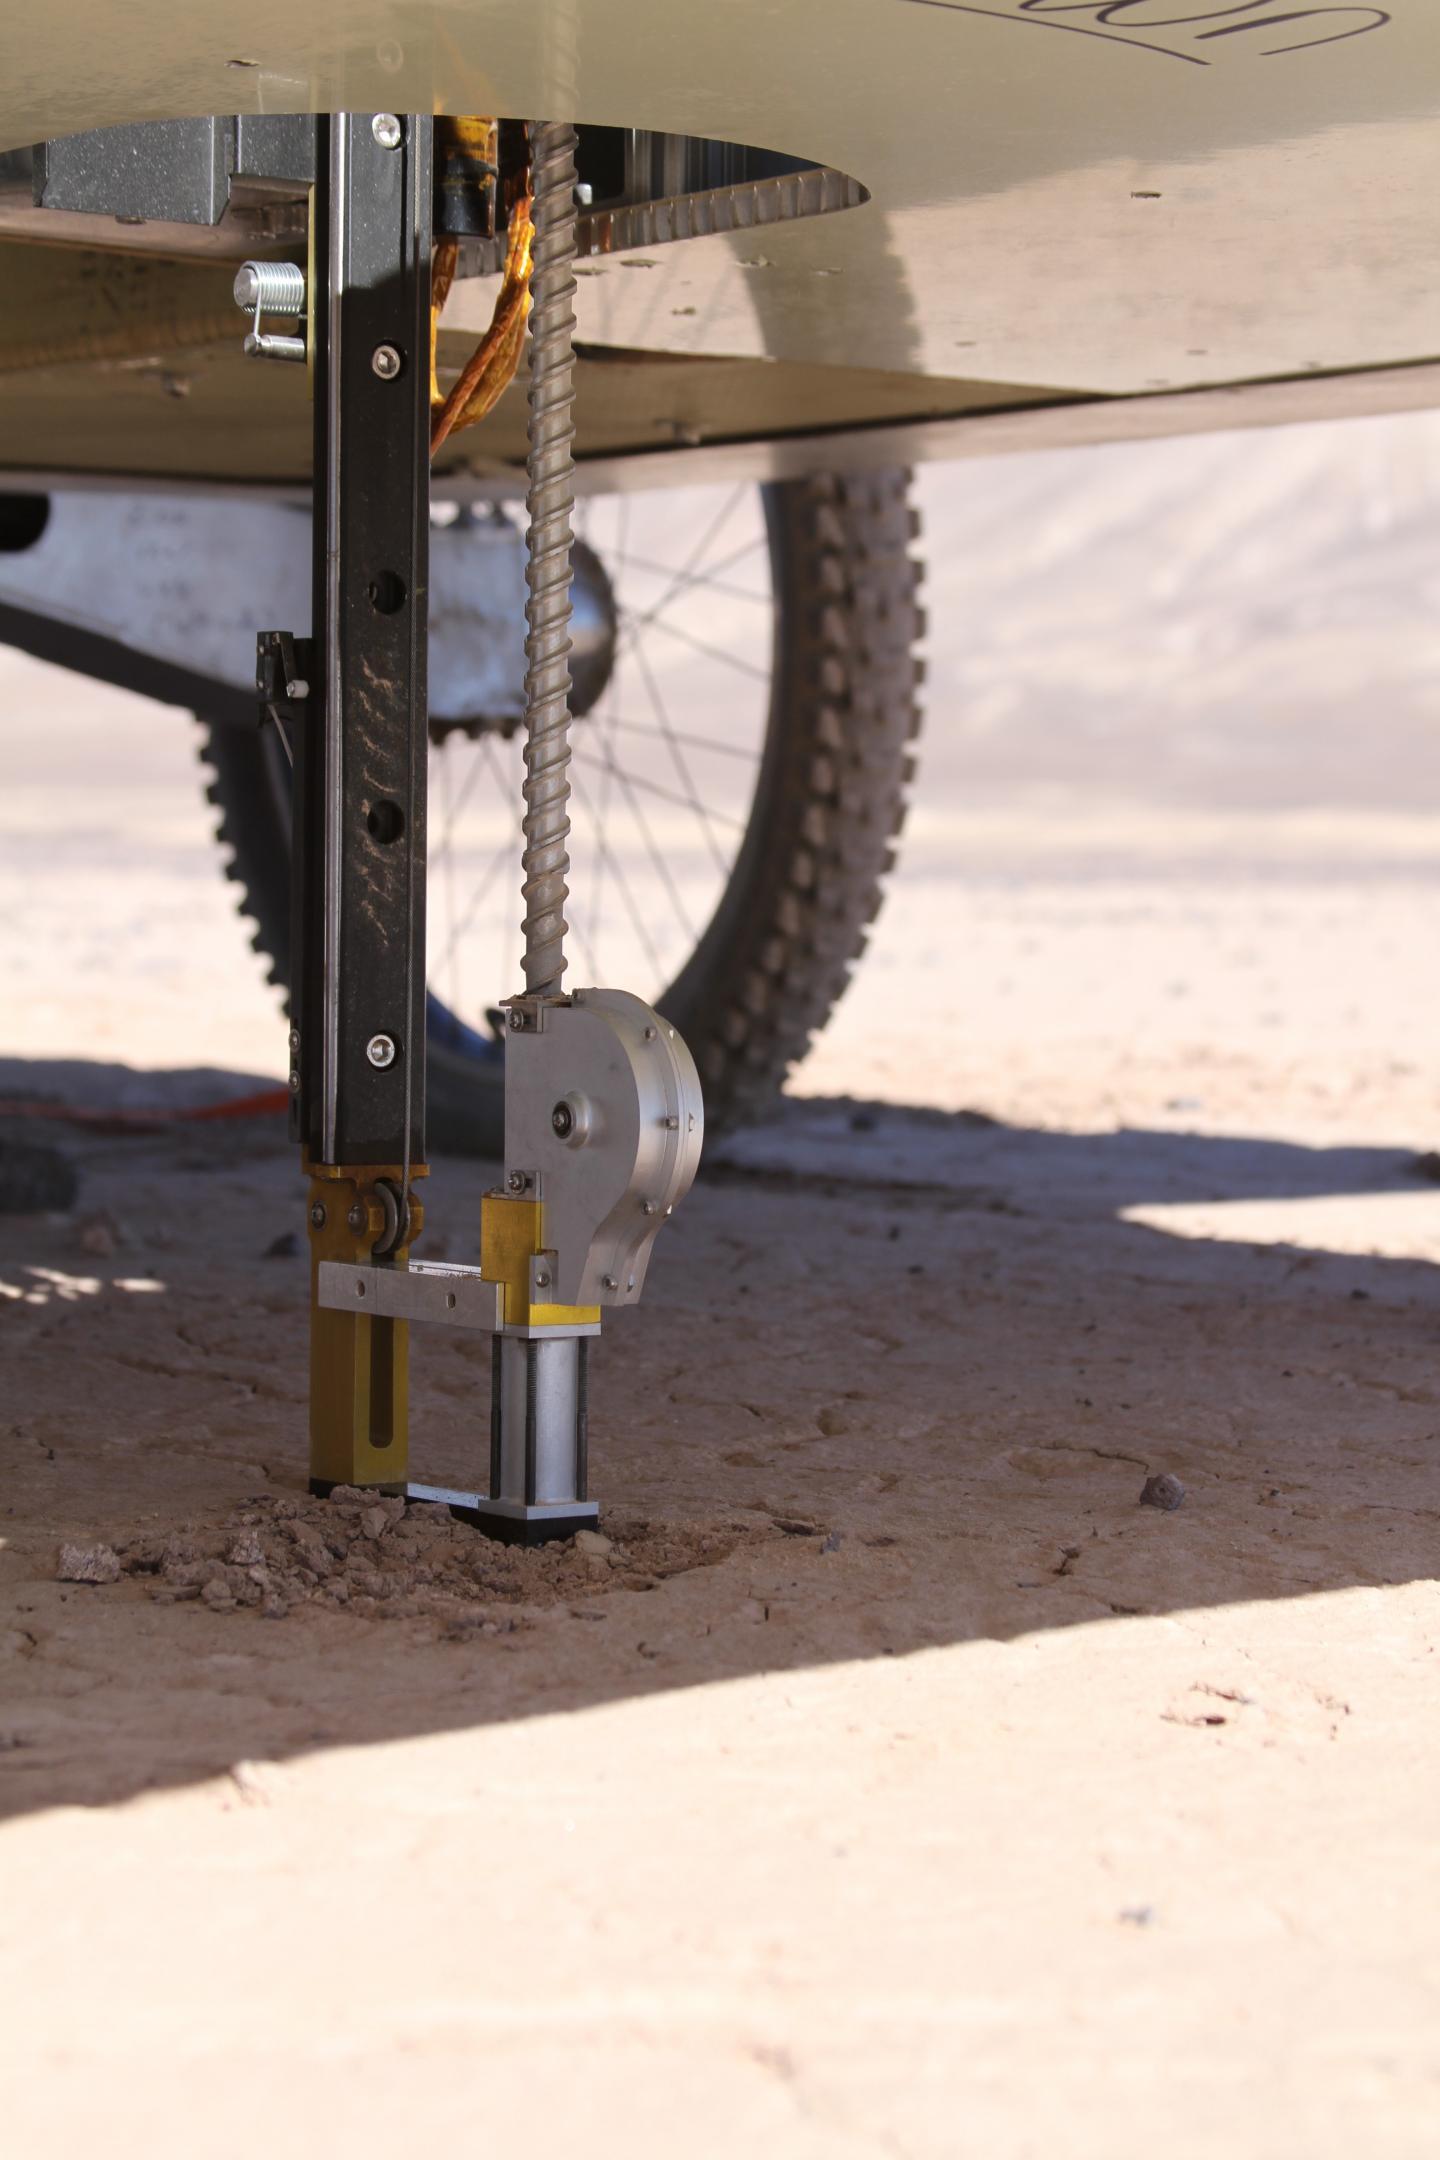 A trial NASA rover mission in the Mars-like Atacama desert.